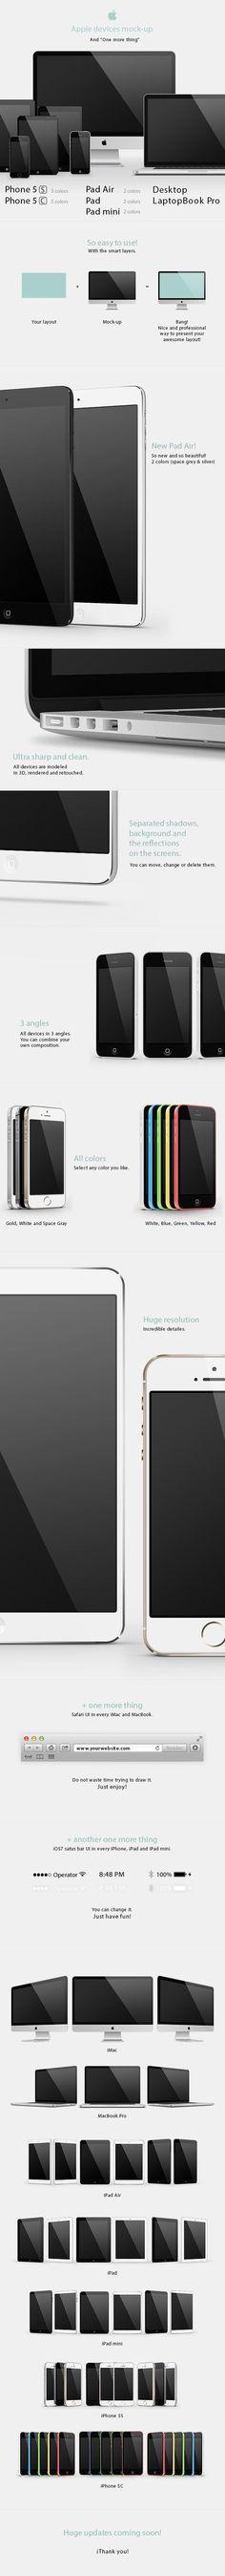 Mock ups of Apple